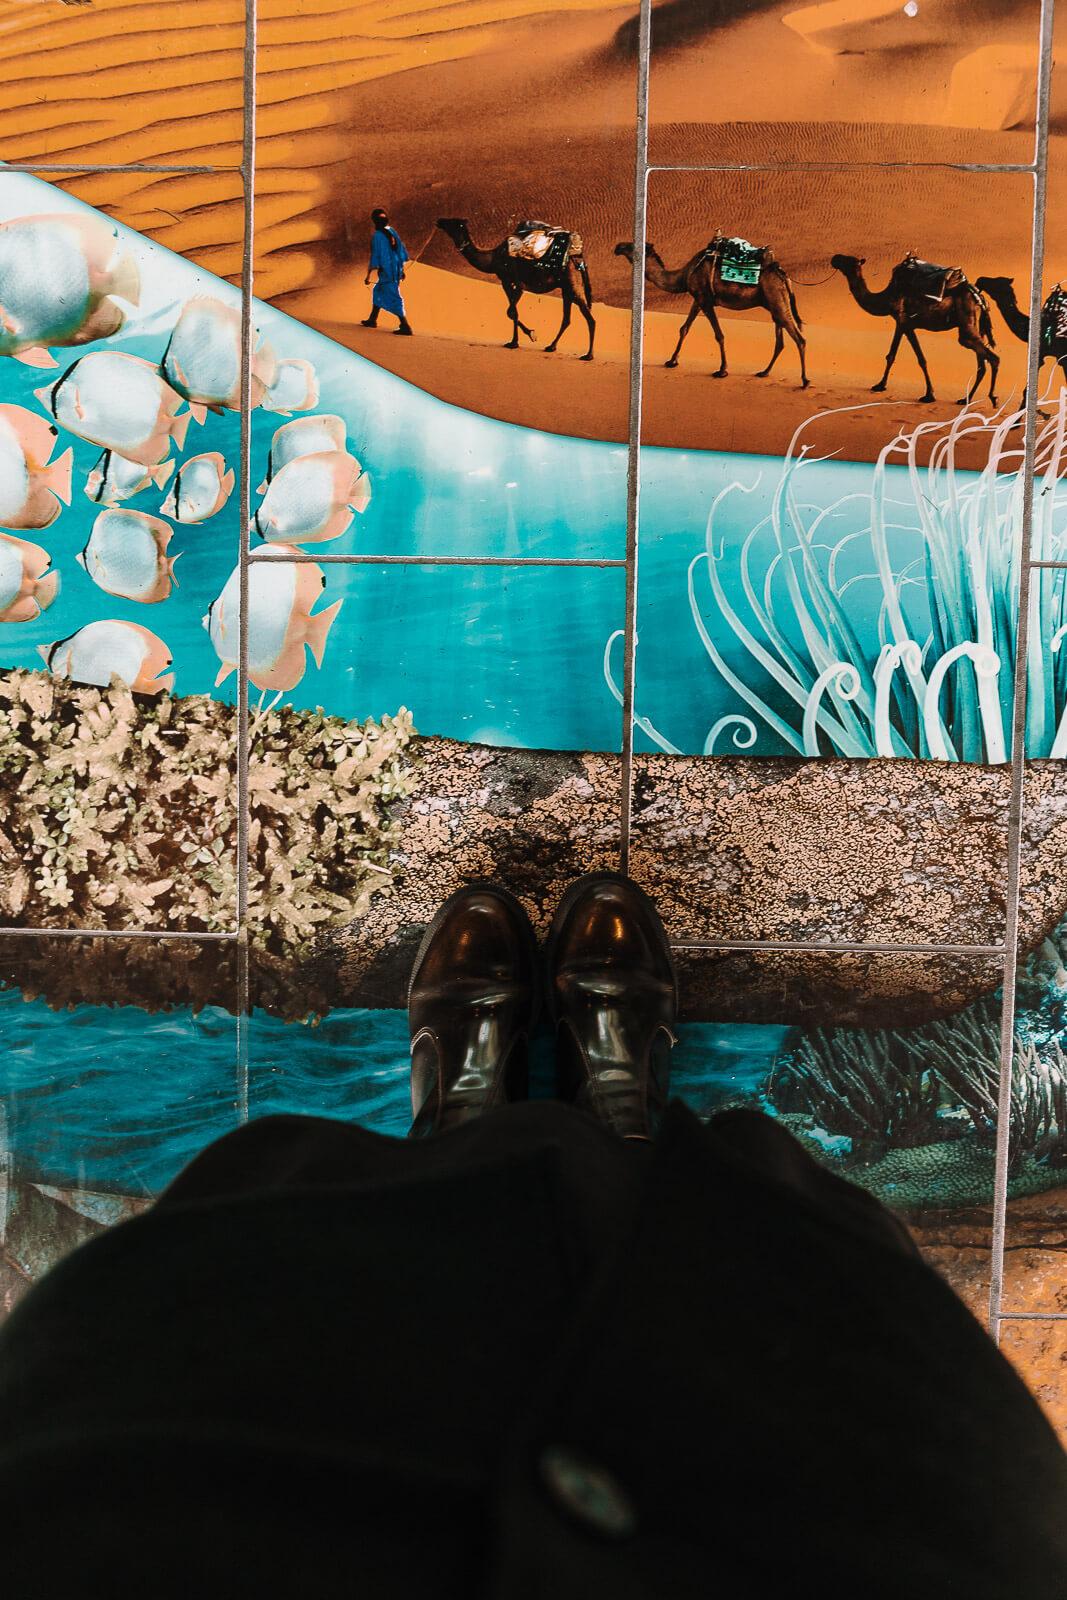 Bremerhaven, Bremerhaven Klimahaus, Klimahaus Bremerhaven, Restessen, Zero Waste Kochen, Zero Waste Kitchen, Zero Waste Essen, Lebensmittelverschwendung, Lebensmittel, Atlantic Hotel Sail City Bremerhaven, Atlantic Hotel, Atlantic Hotel Sail City, Bremerhaven Blog, Bremerhaven Reisen, Resteessen